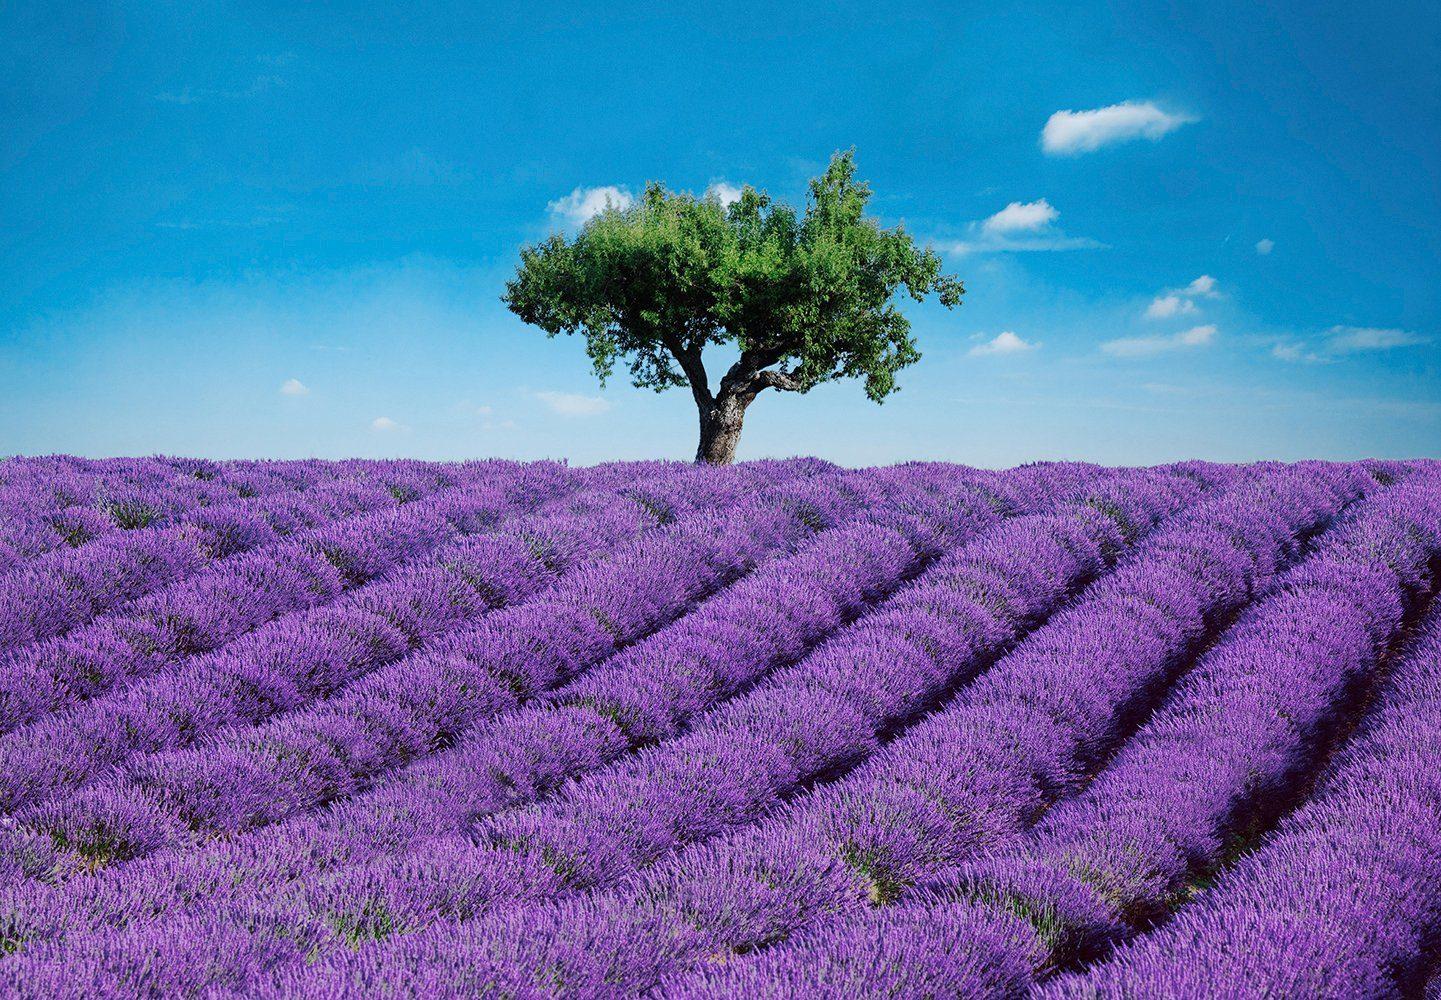 Fototapete »Provence«, 8-teilig, 366x254 cm